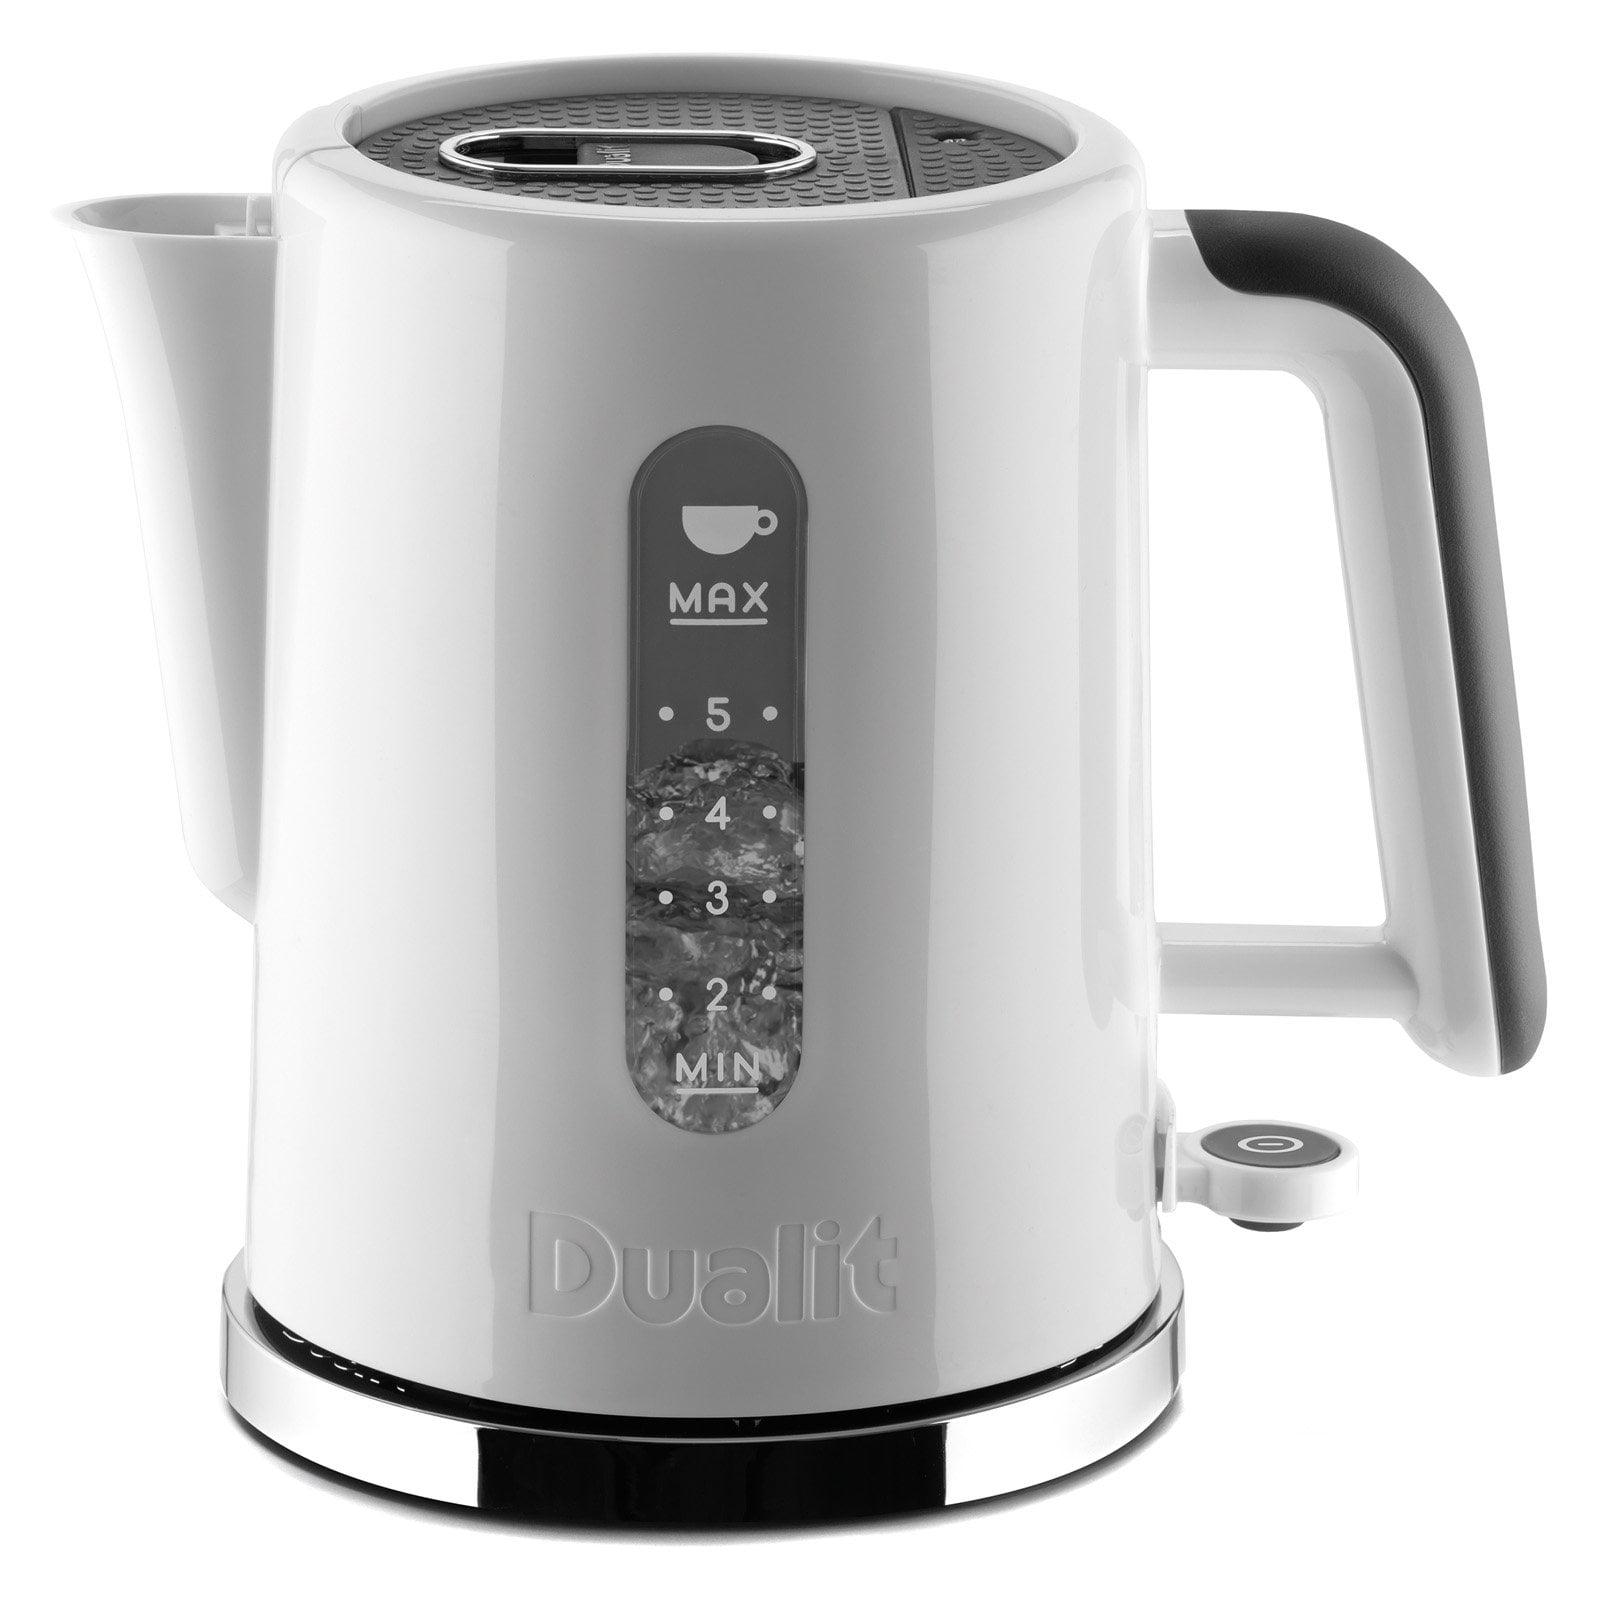 Dualit 72142 Kettle 1.5L - White/gray